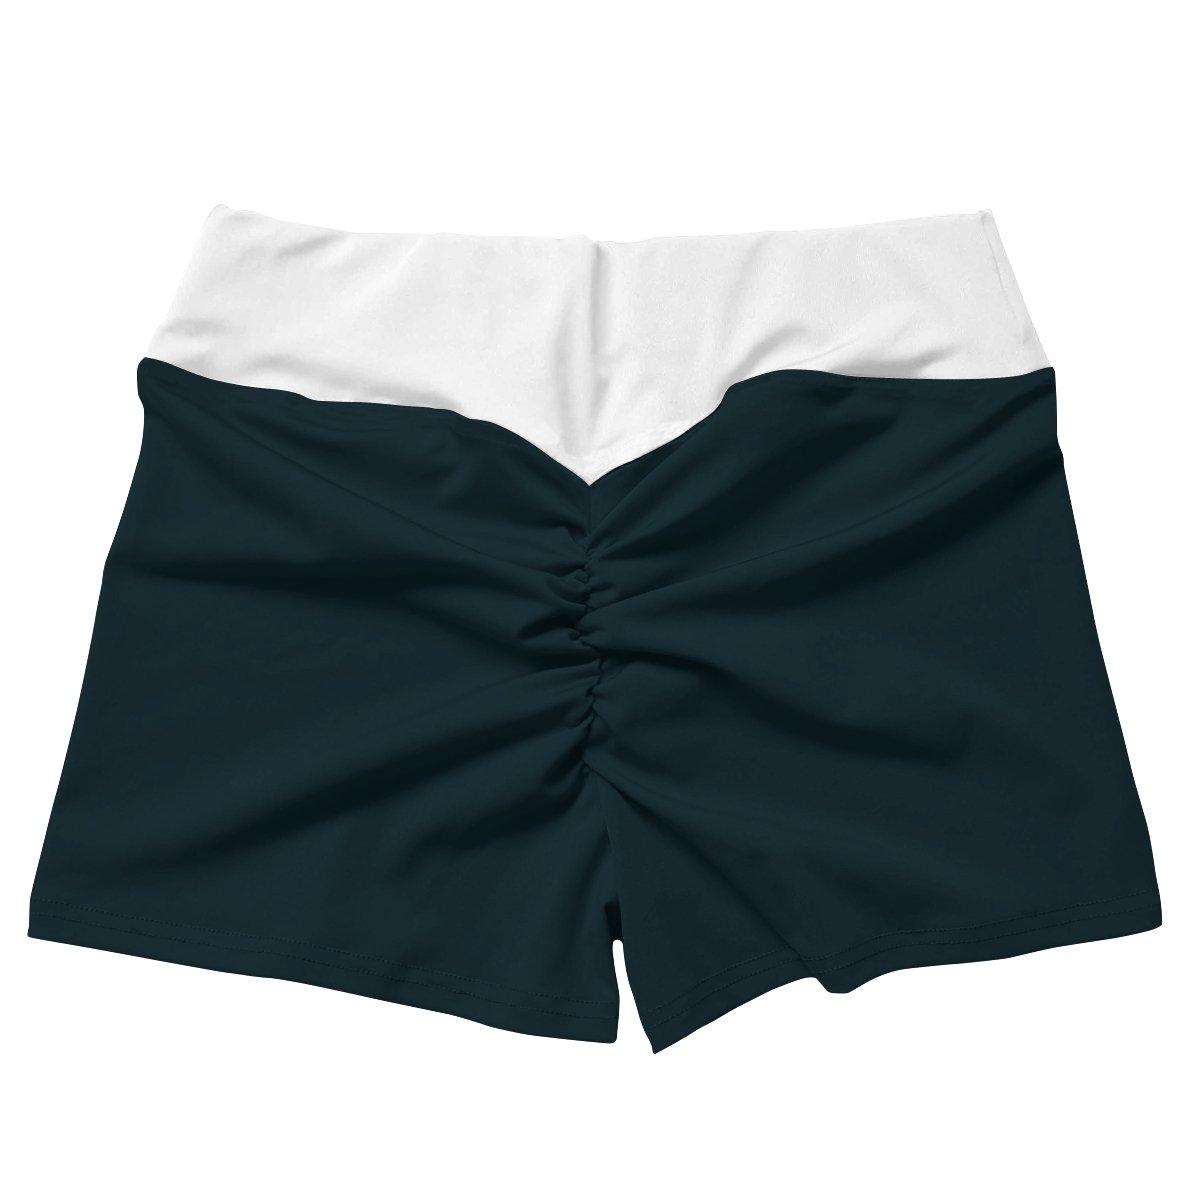 ua high uraraka active wear set 437794 - Anime Swimsuits